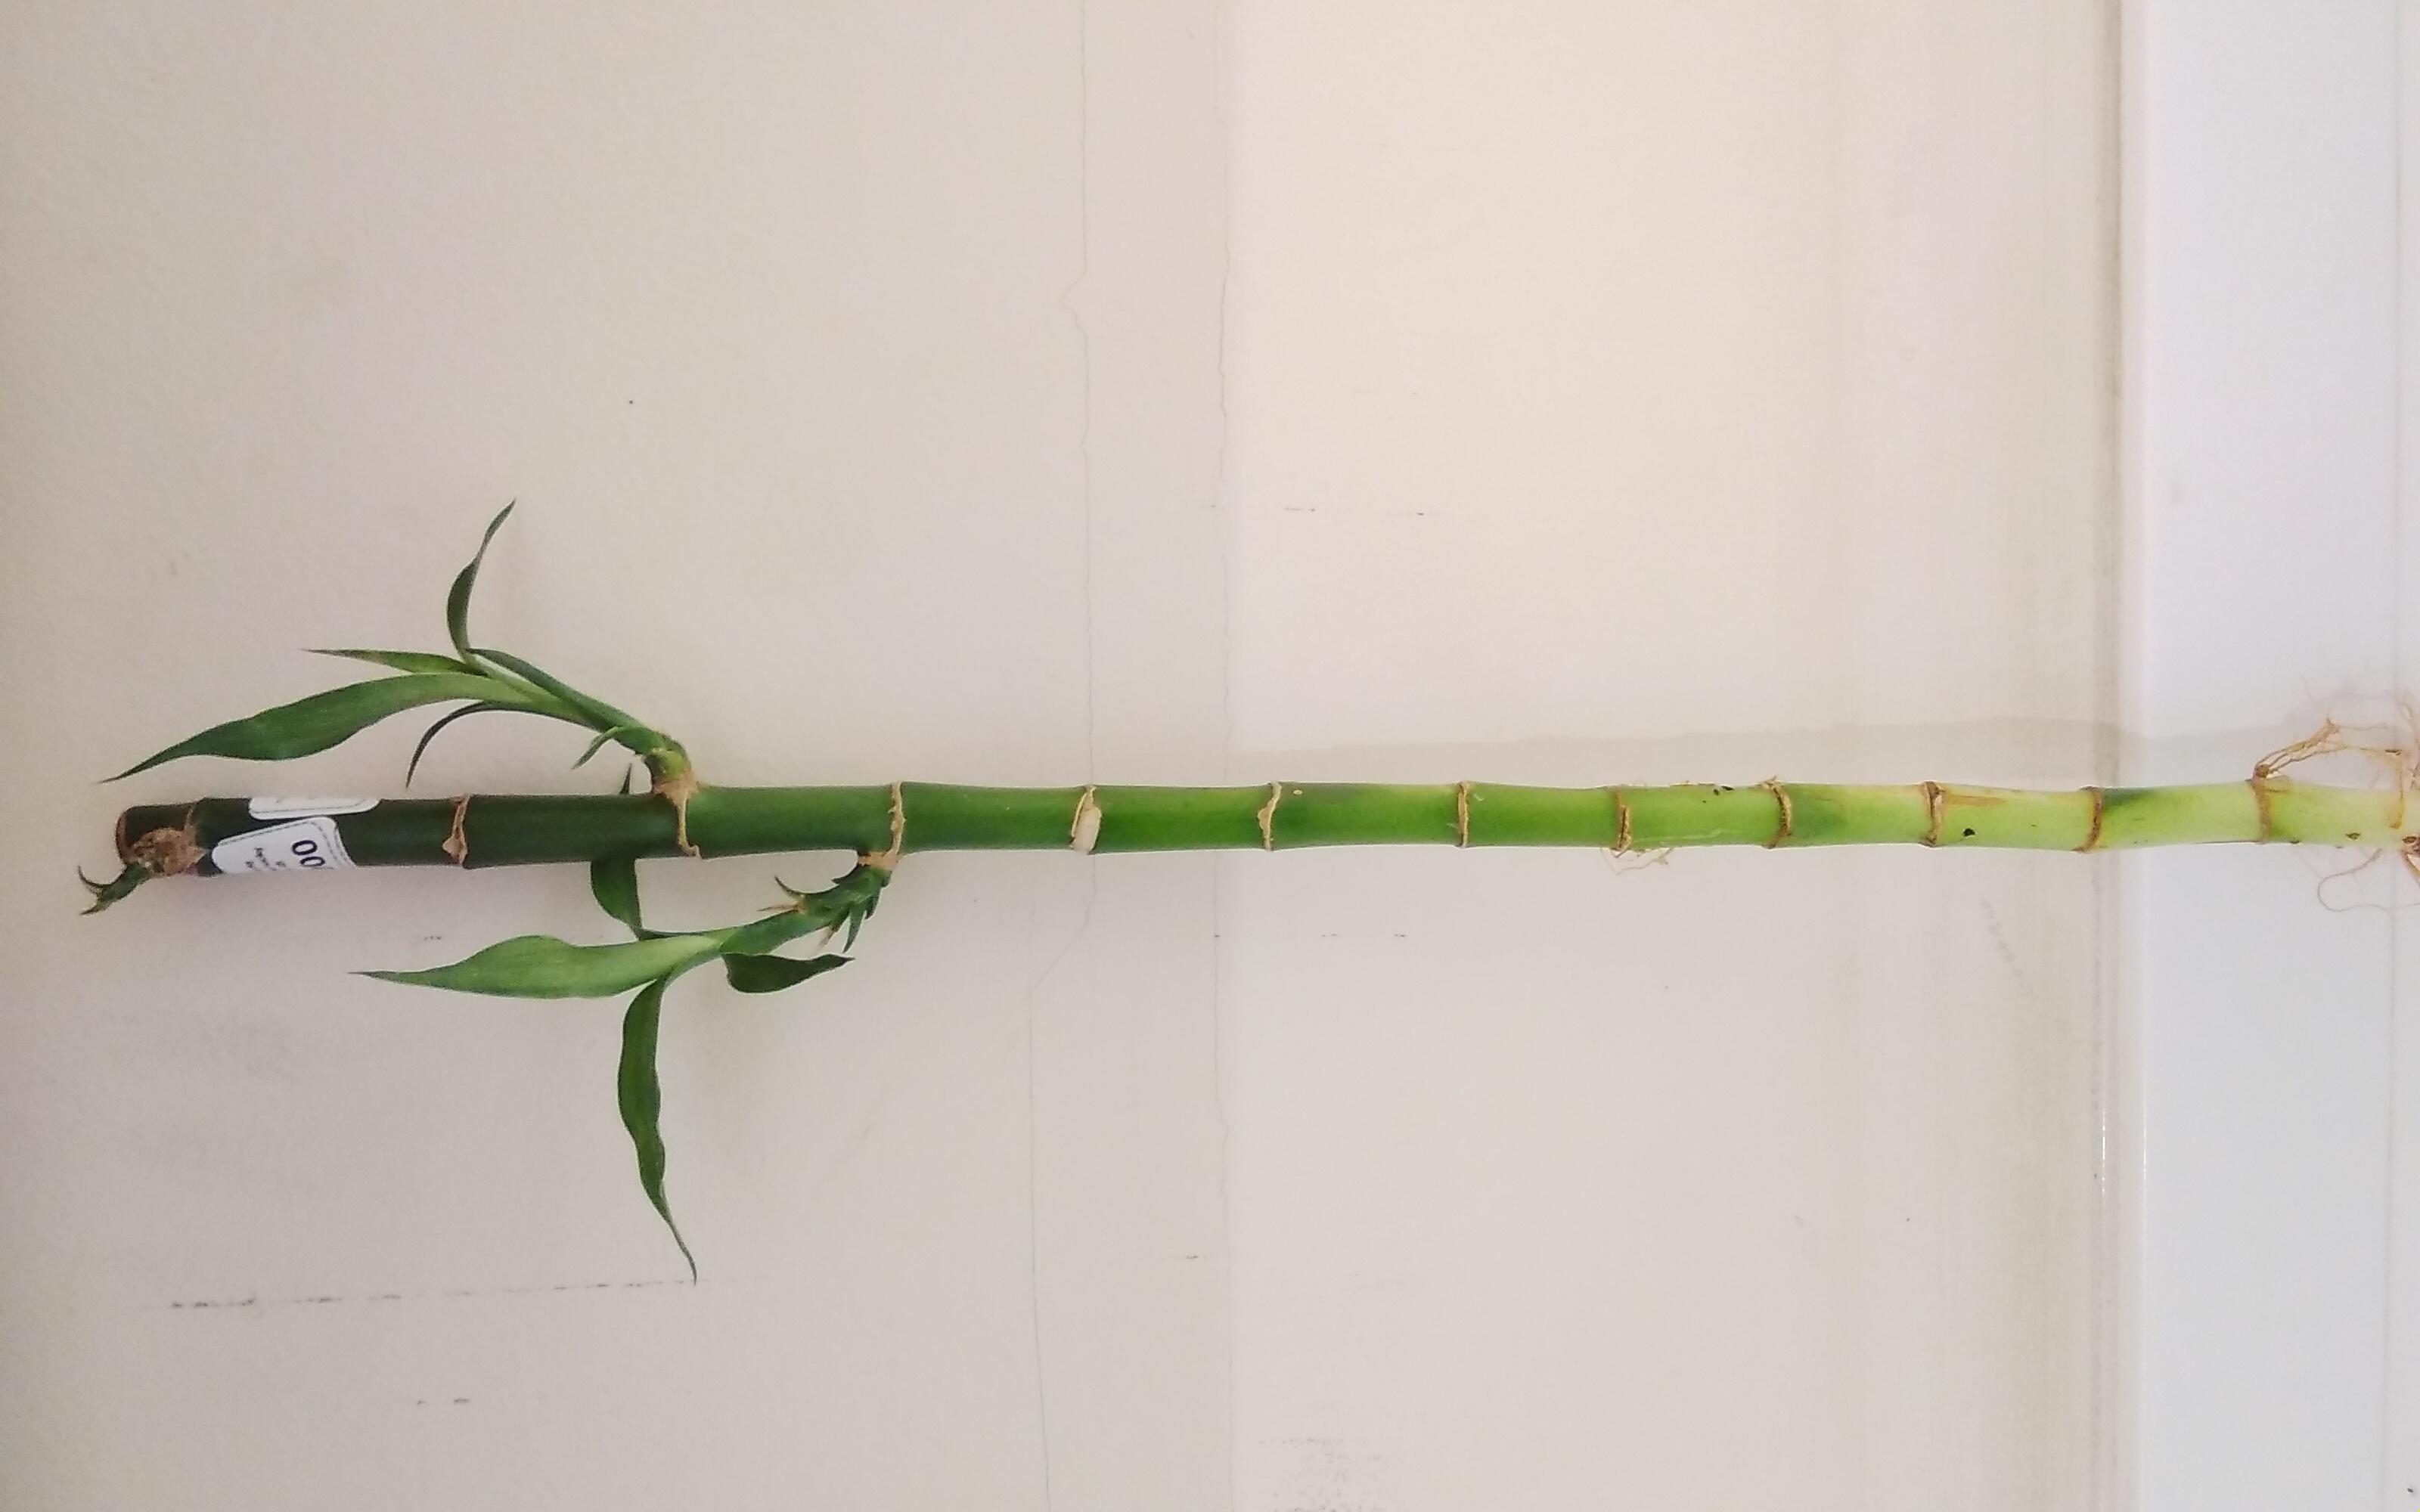 لاكي بامبو نباتات داخلية